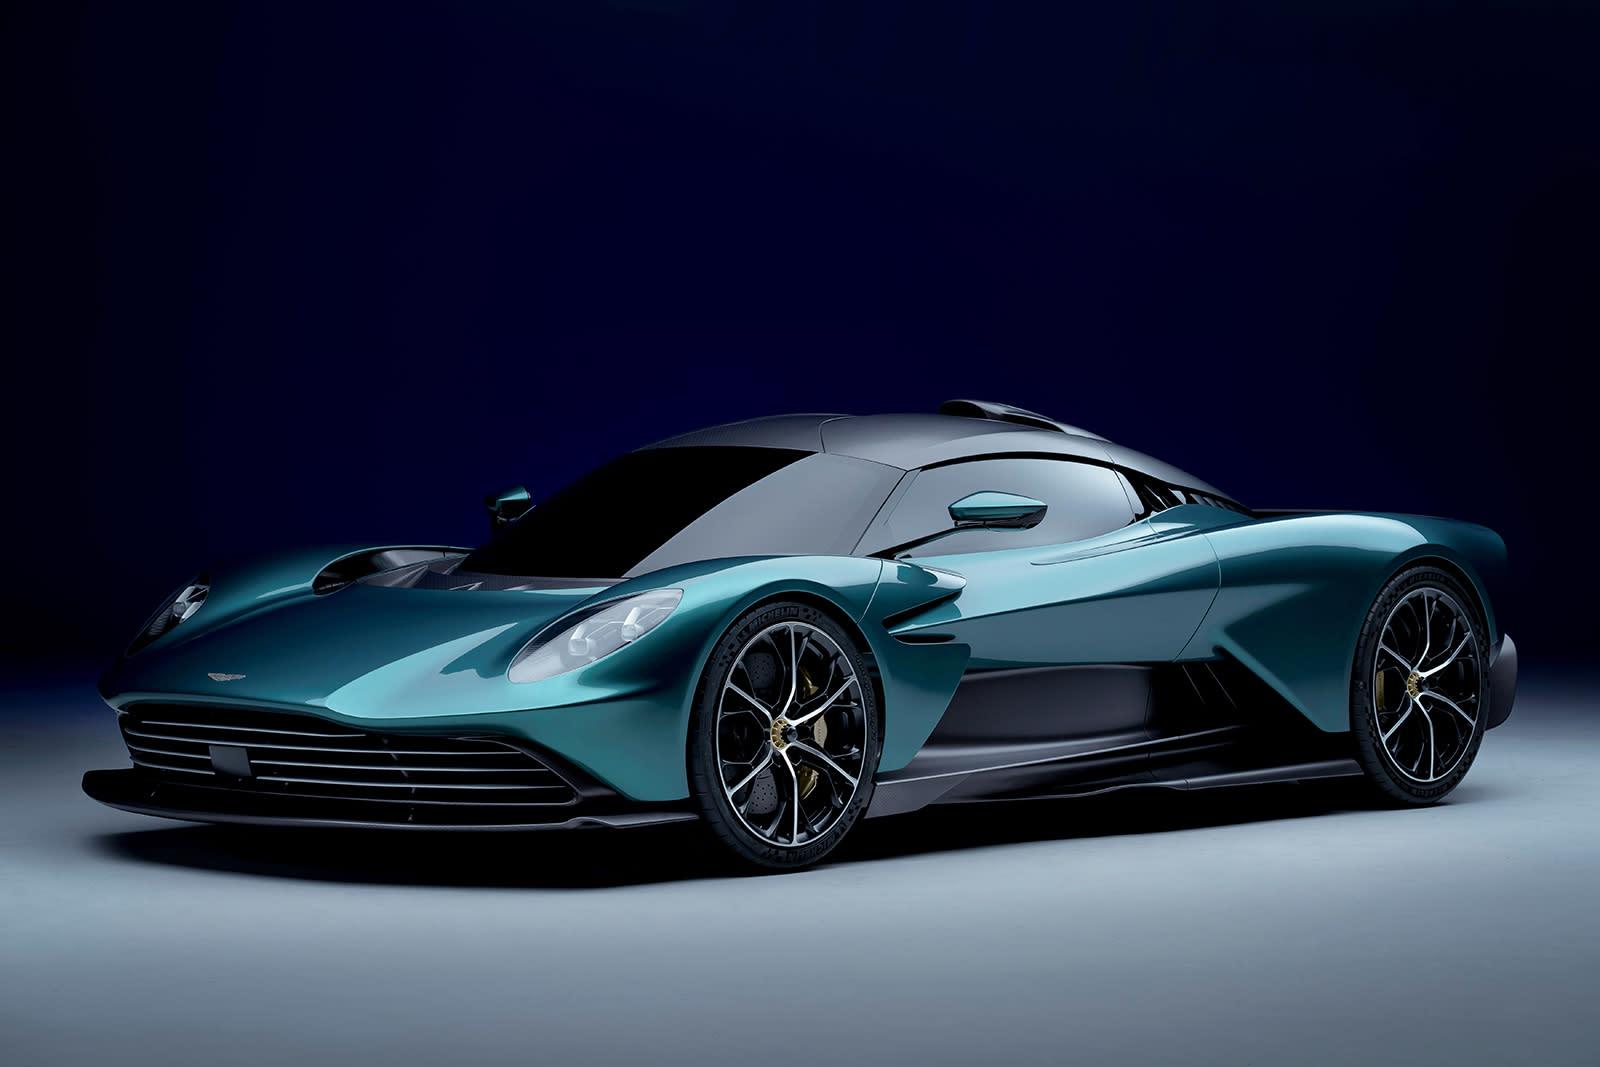 Aston Martin Valhalla plug-in hybrid supercar